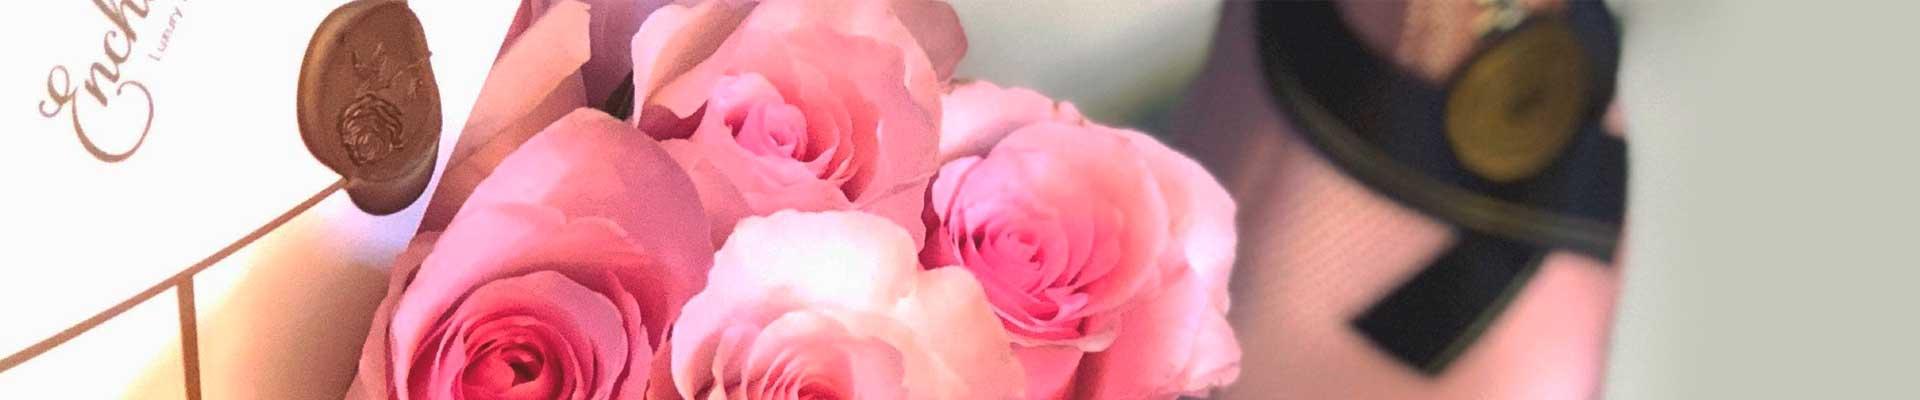 arranjos e buques de rosas